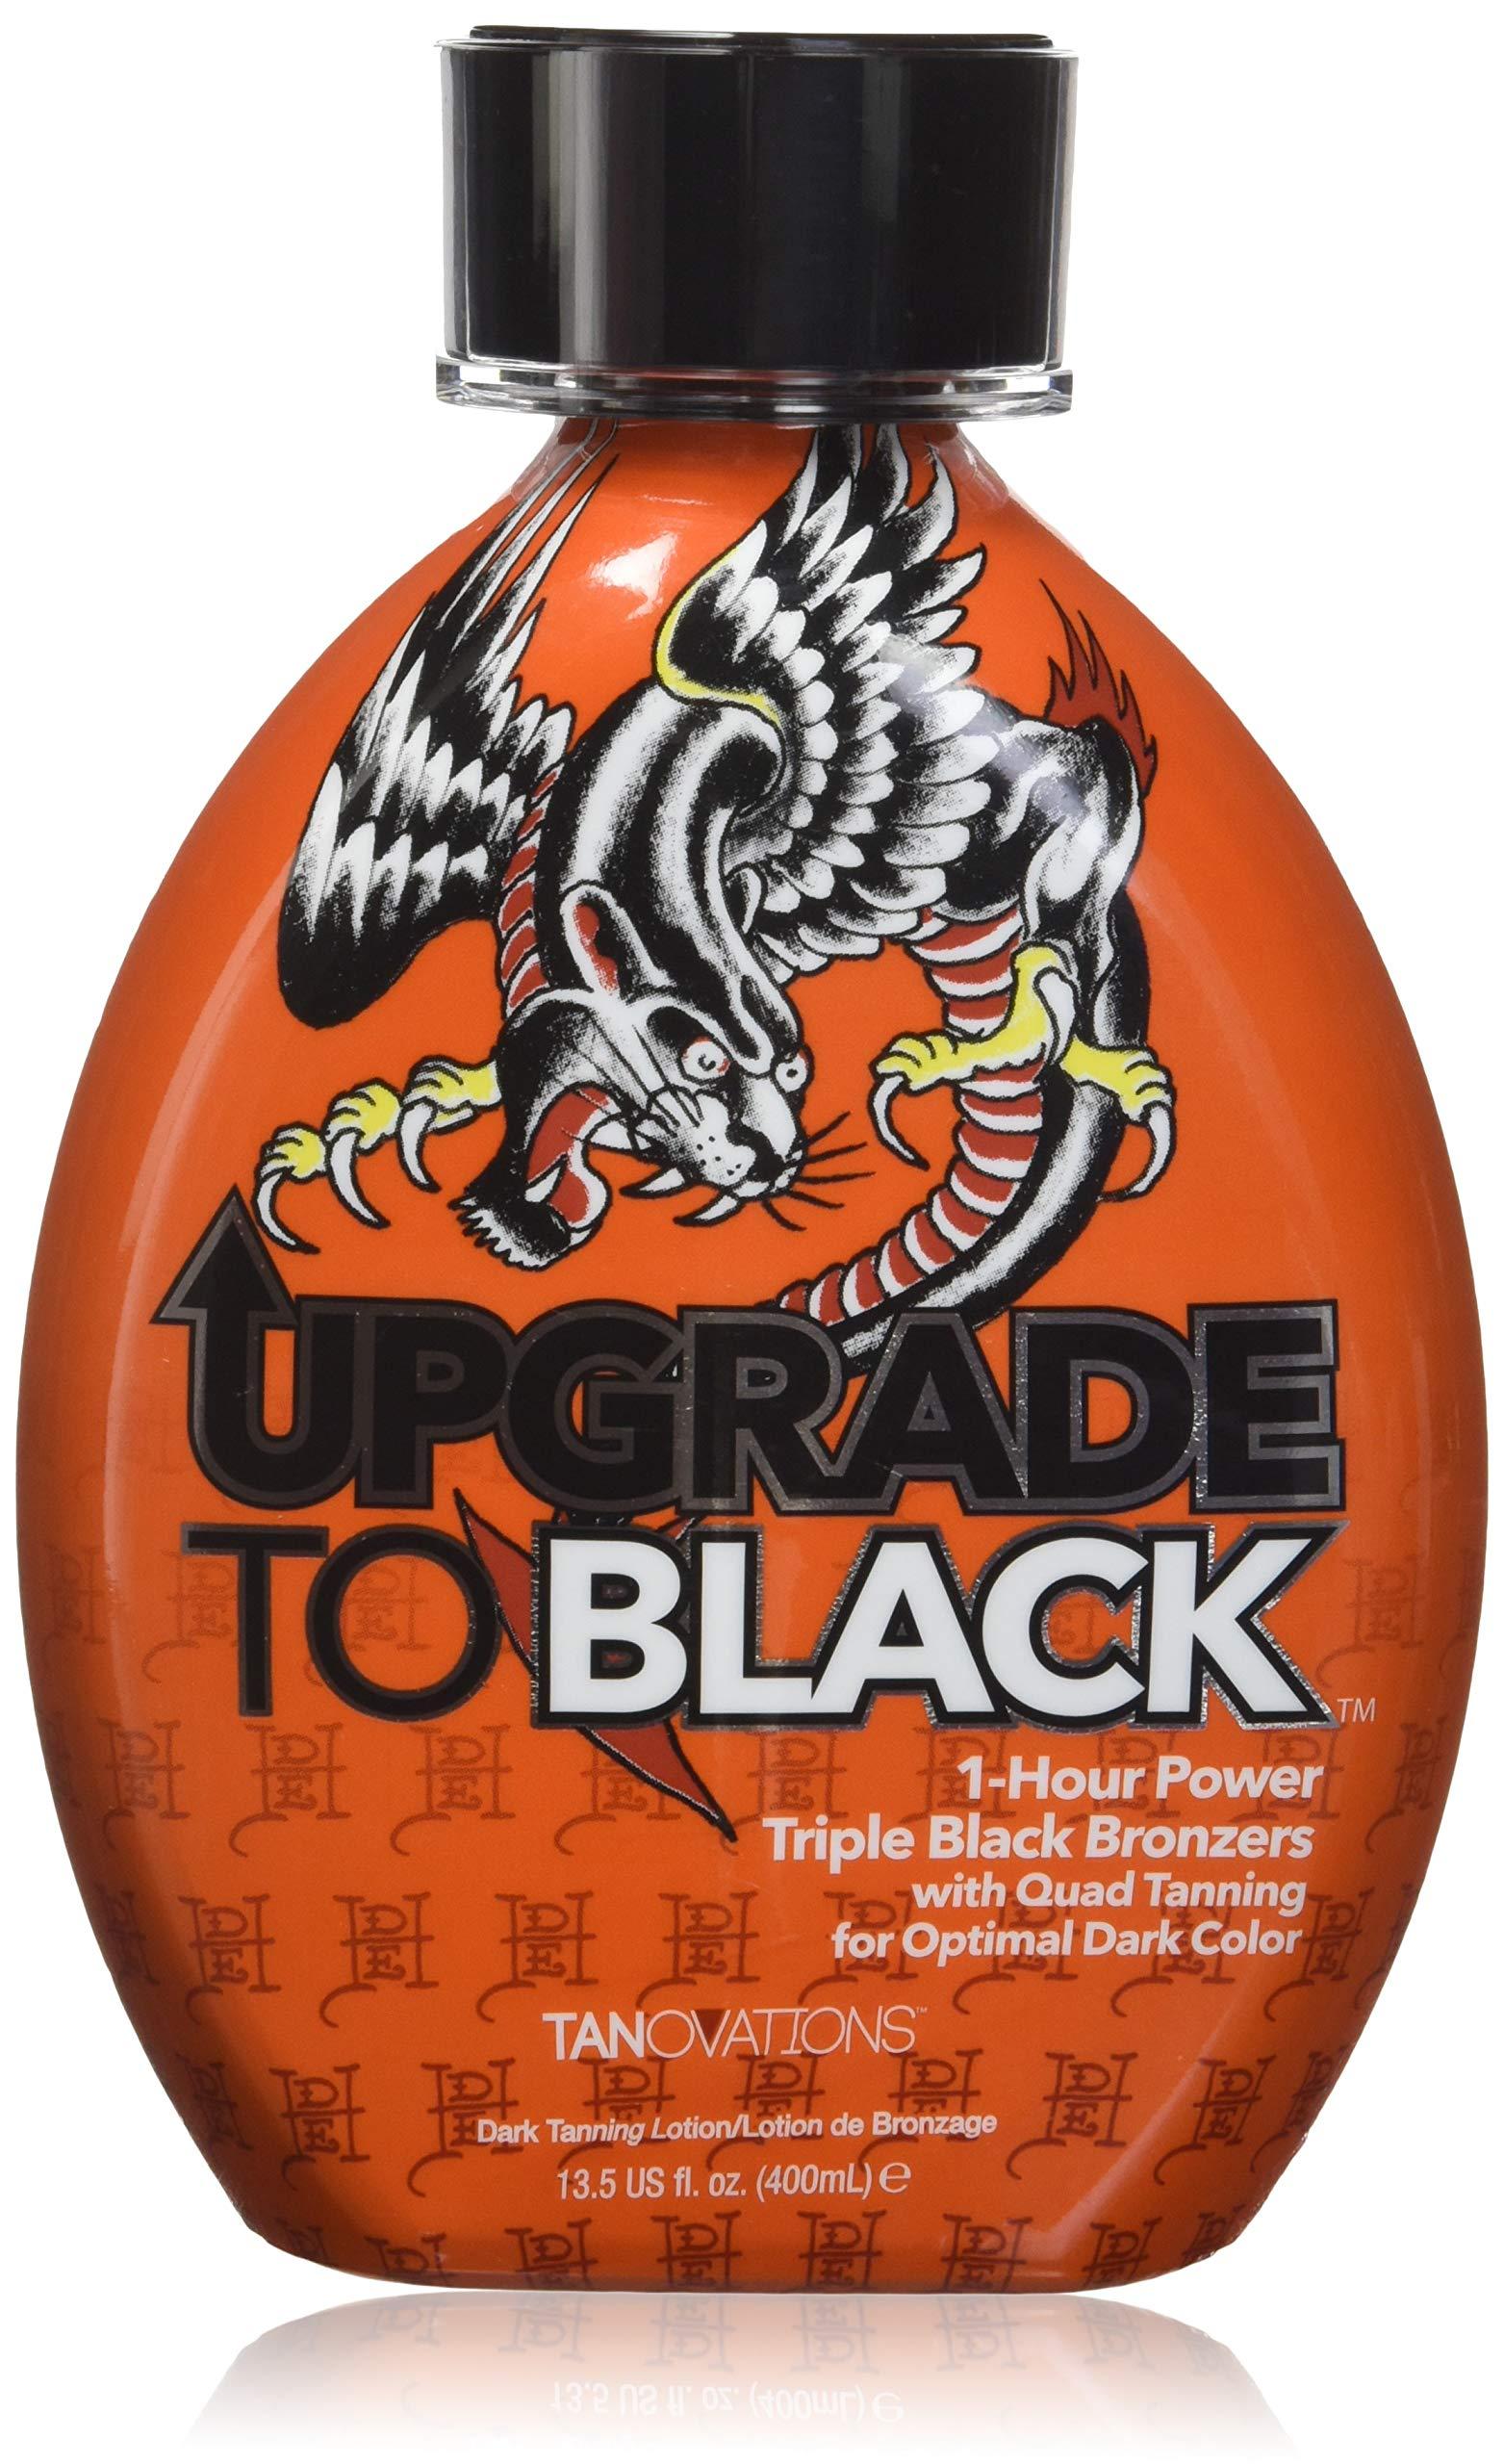 Hardy UPGRADE BLACK Triple Bronzer